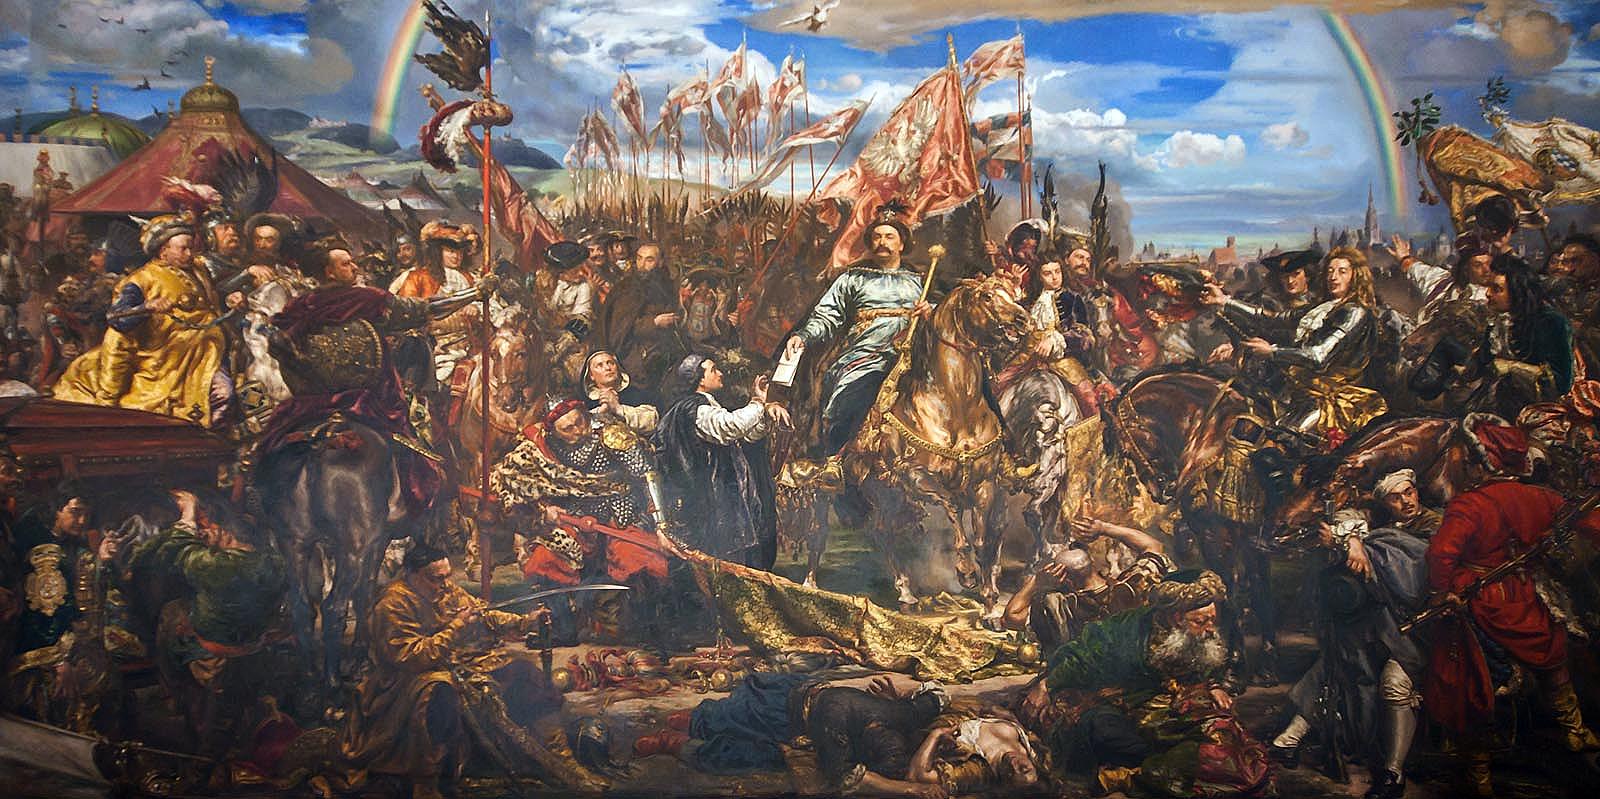 an interpretation of jan matejkos sobieski sending message of victory to the pope King john iii sobieski sending a message of victory to the pope after the battle  of vienna by jan matejko, 1880 [national museum, kraków].